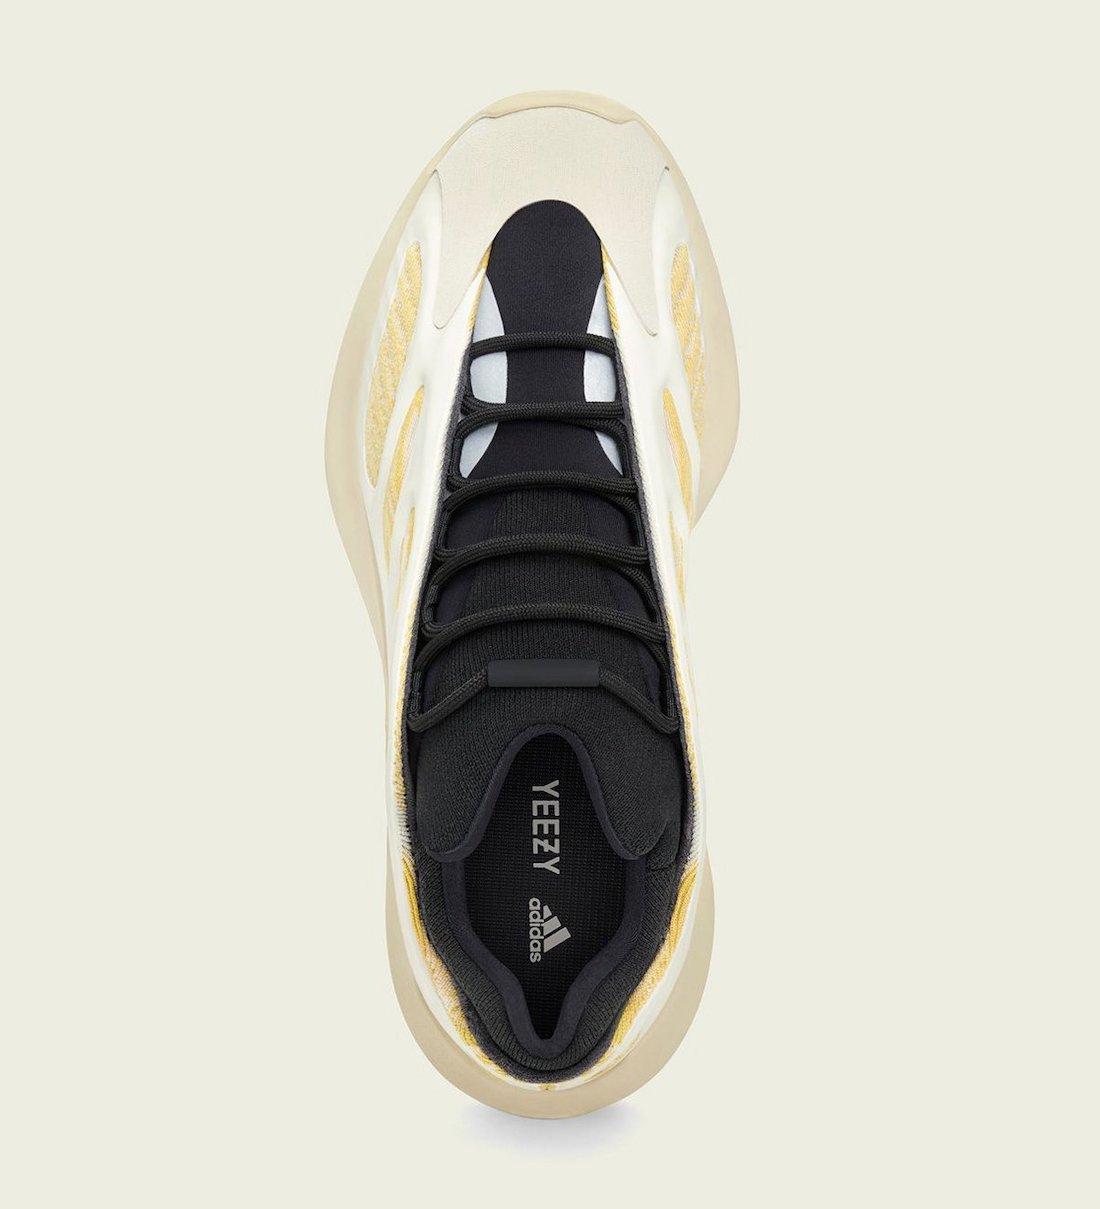 adidas Yeezy 700 V3 'Safflower' G54853 2